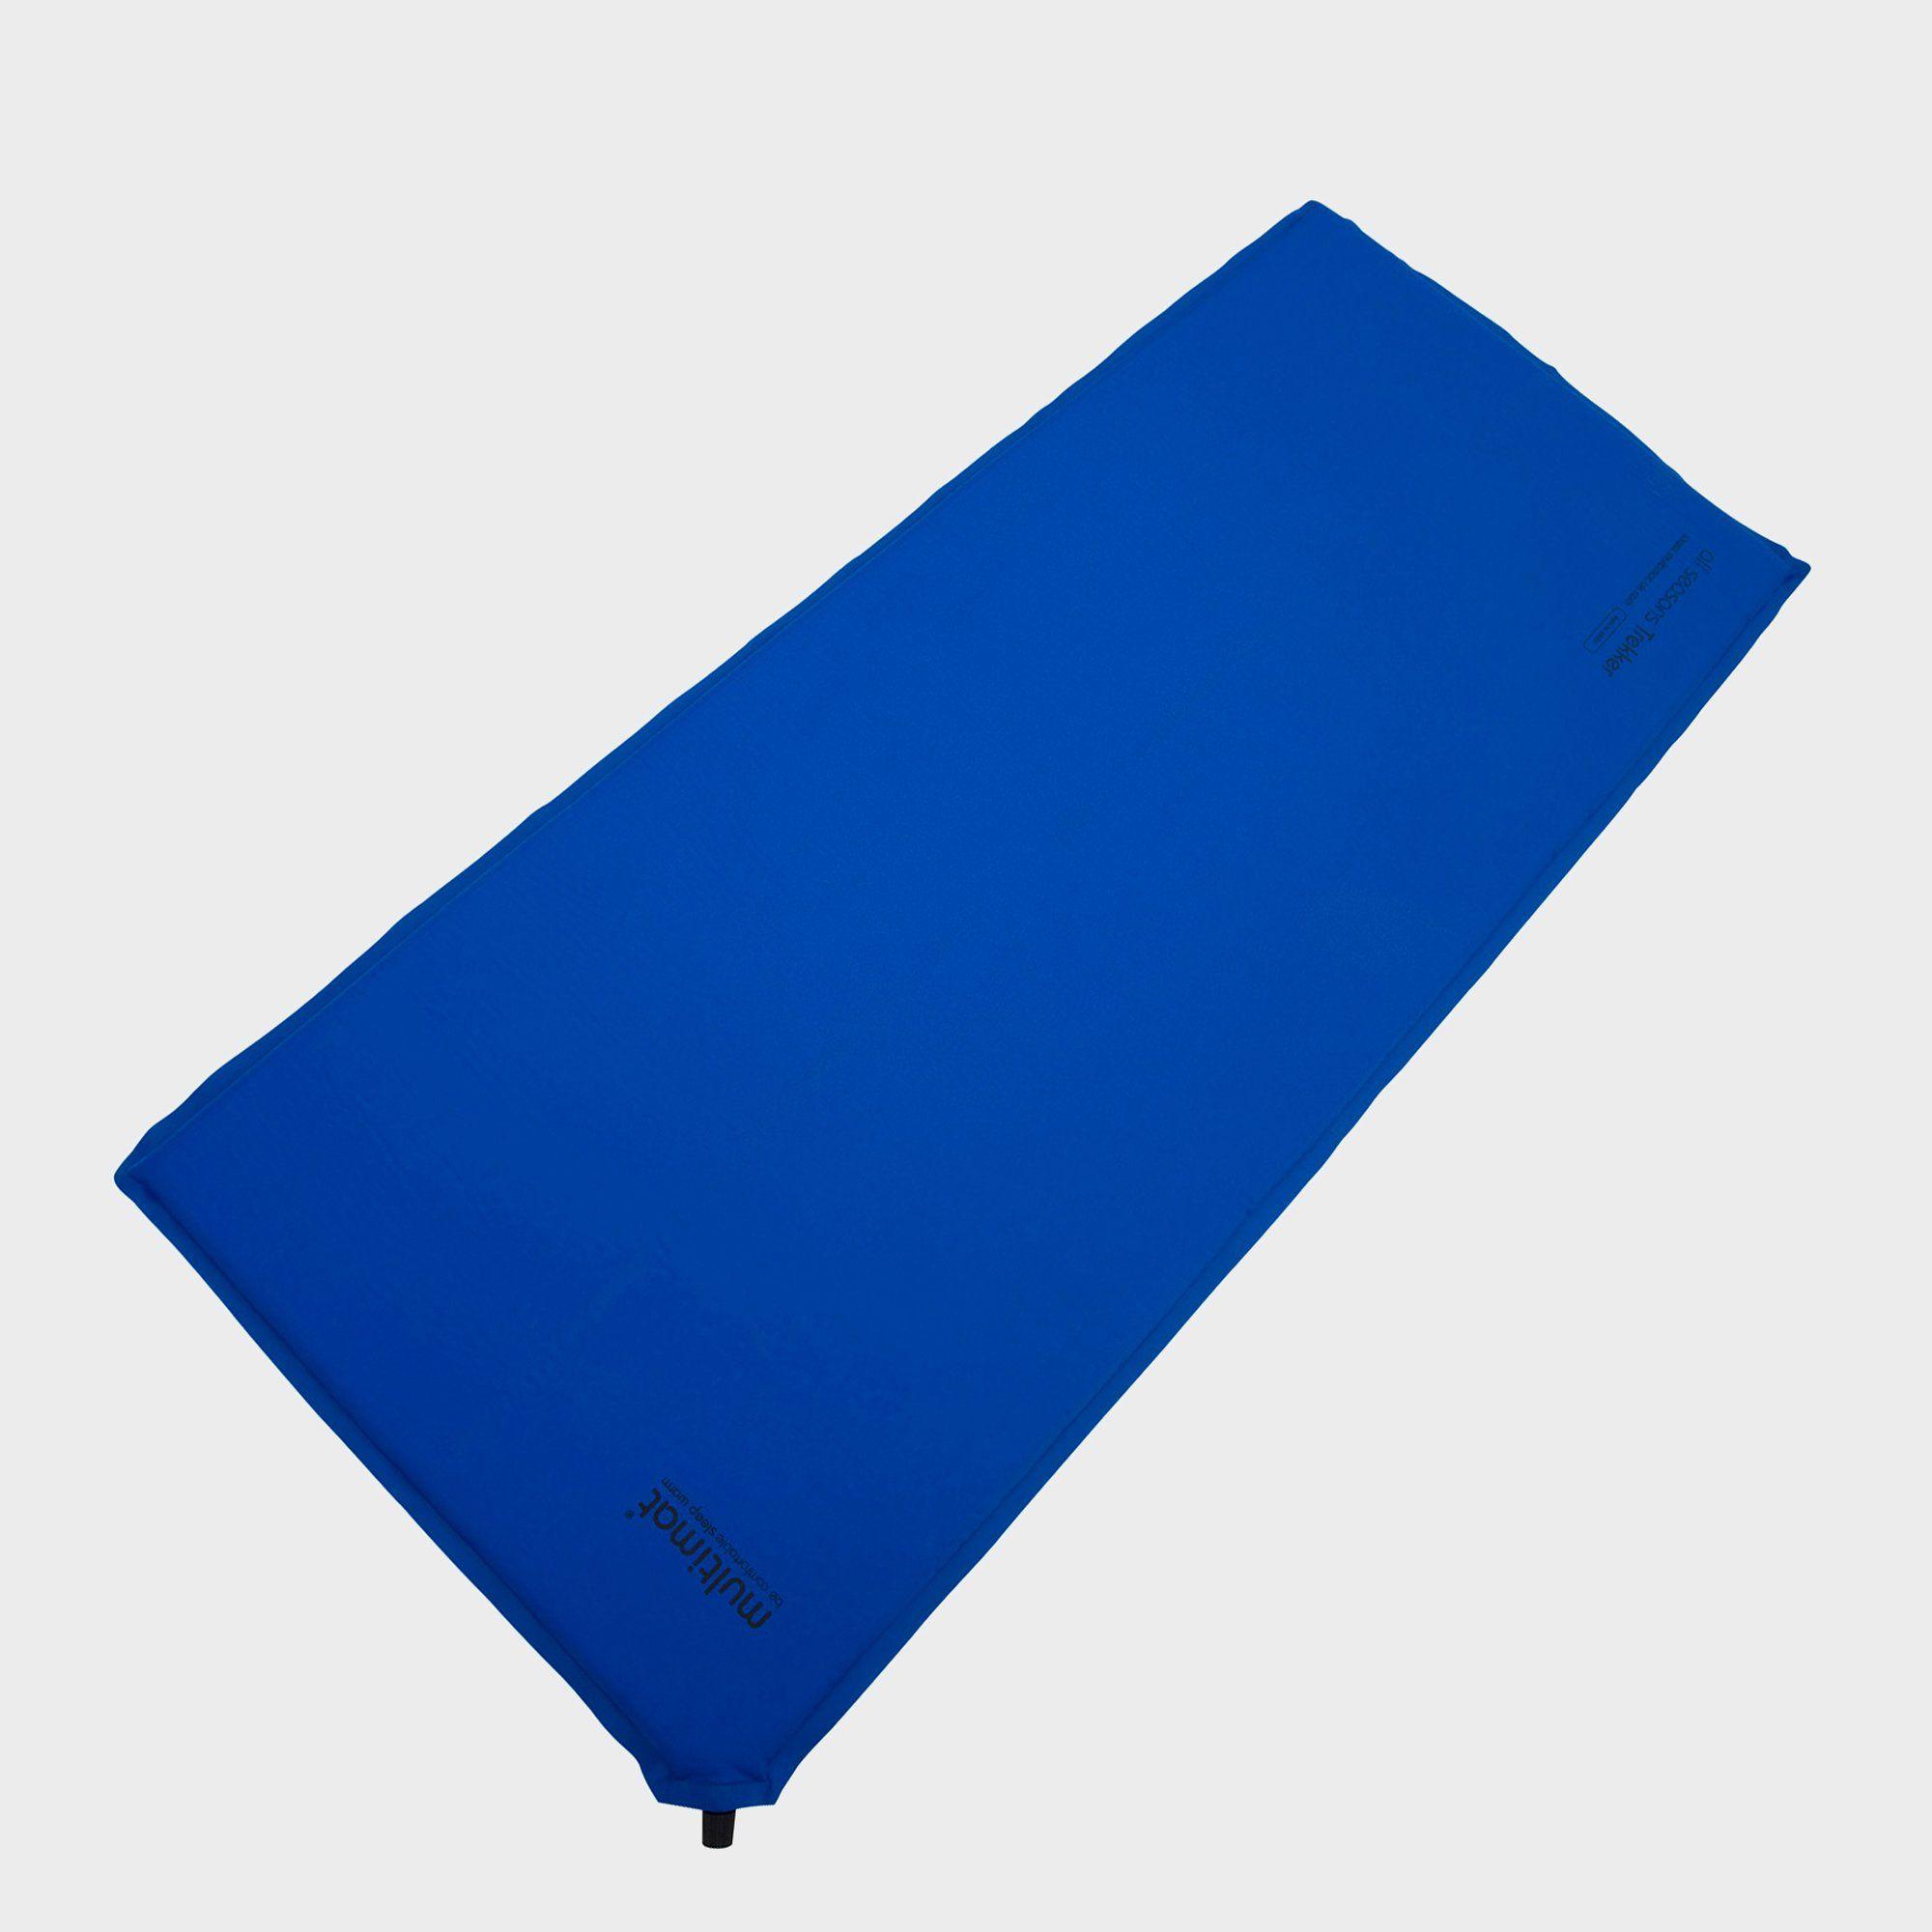 MULTIMAT Trekker Compact 25 Self Inflating Sleeping Mat (Small)